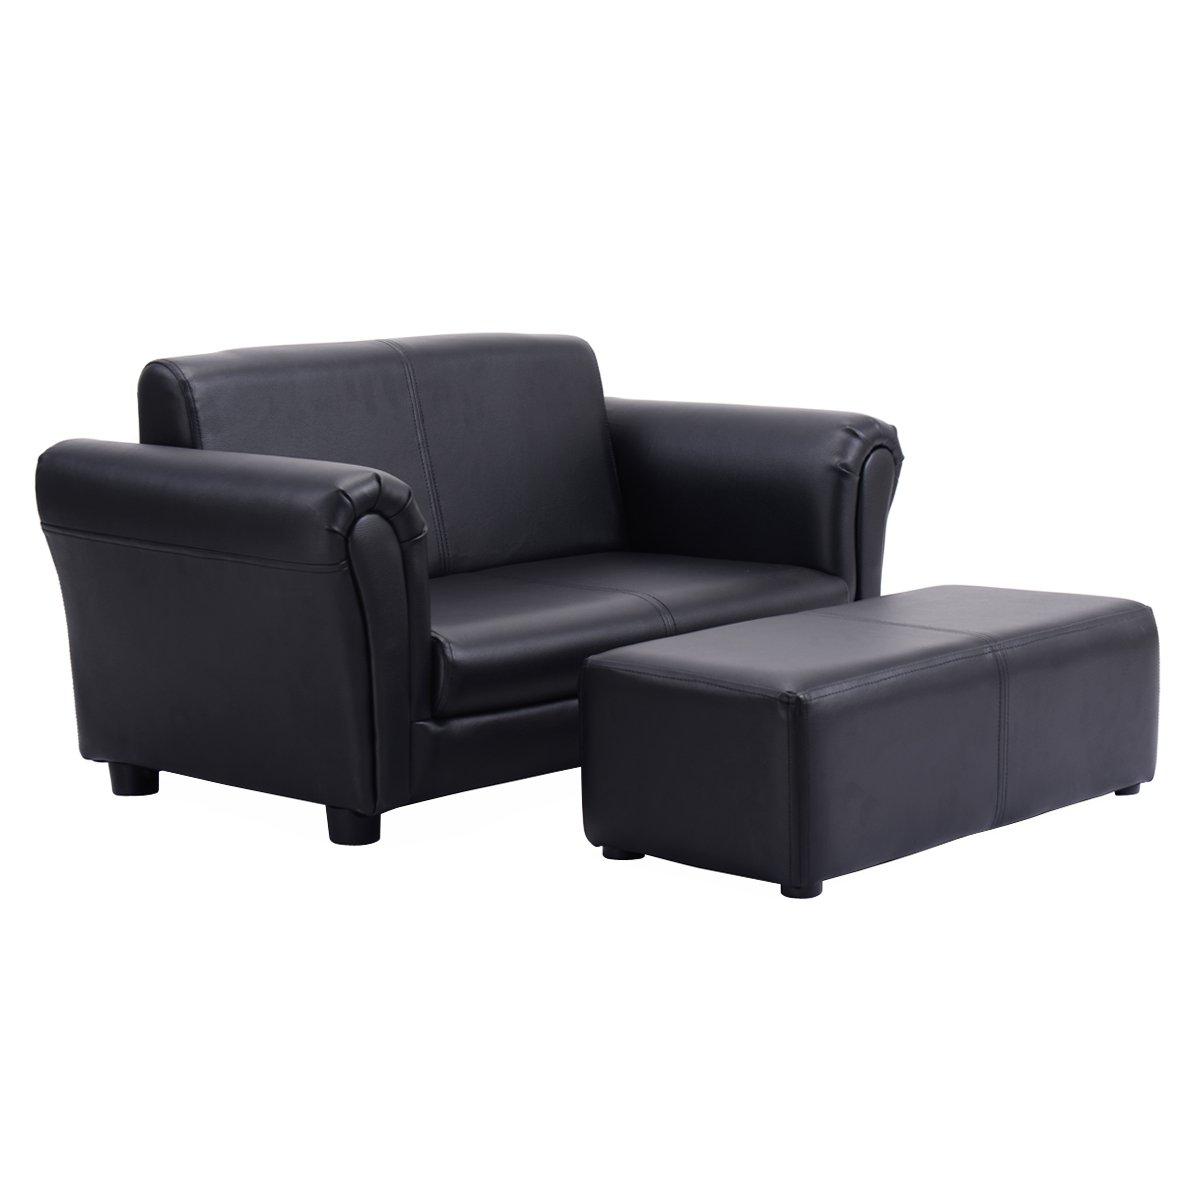 Costzon Kids Sofa Set 2 Seater Armrest Children Couch Lounge w/Footstool (Black)